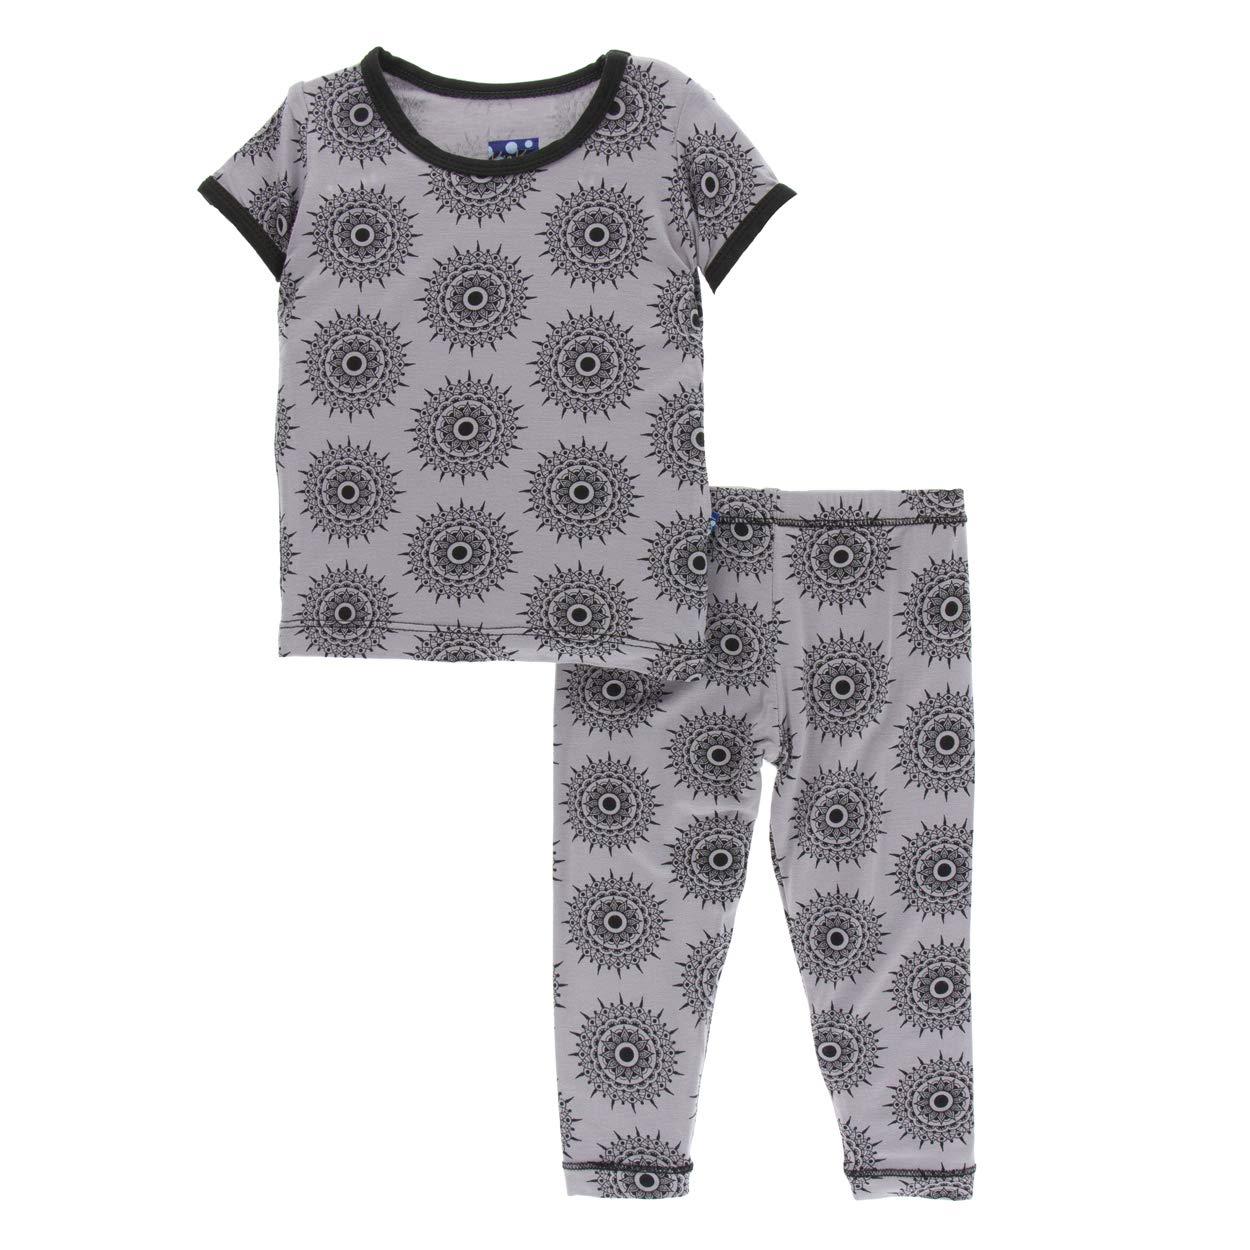 KicKee Pants Print Short Sleeve Pajama Set in Feather Mandala (3T) by Kickee Pants